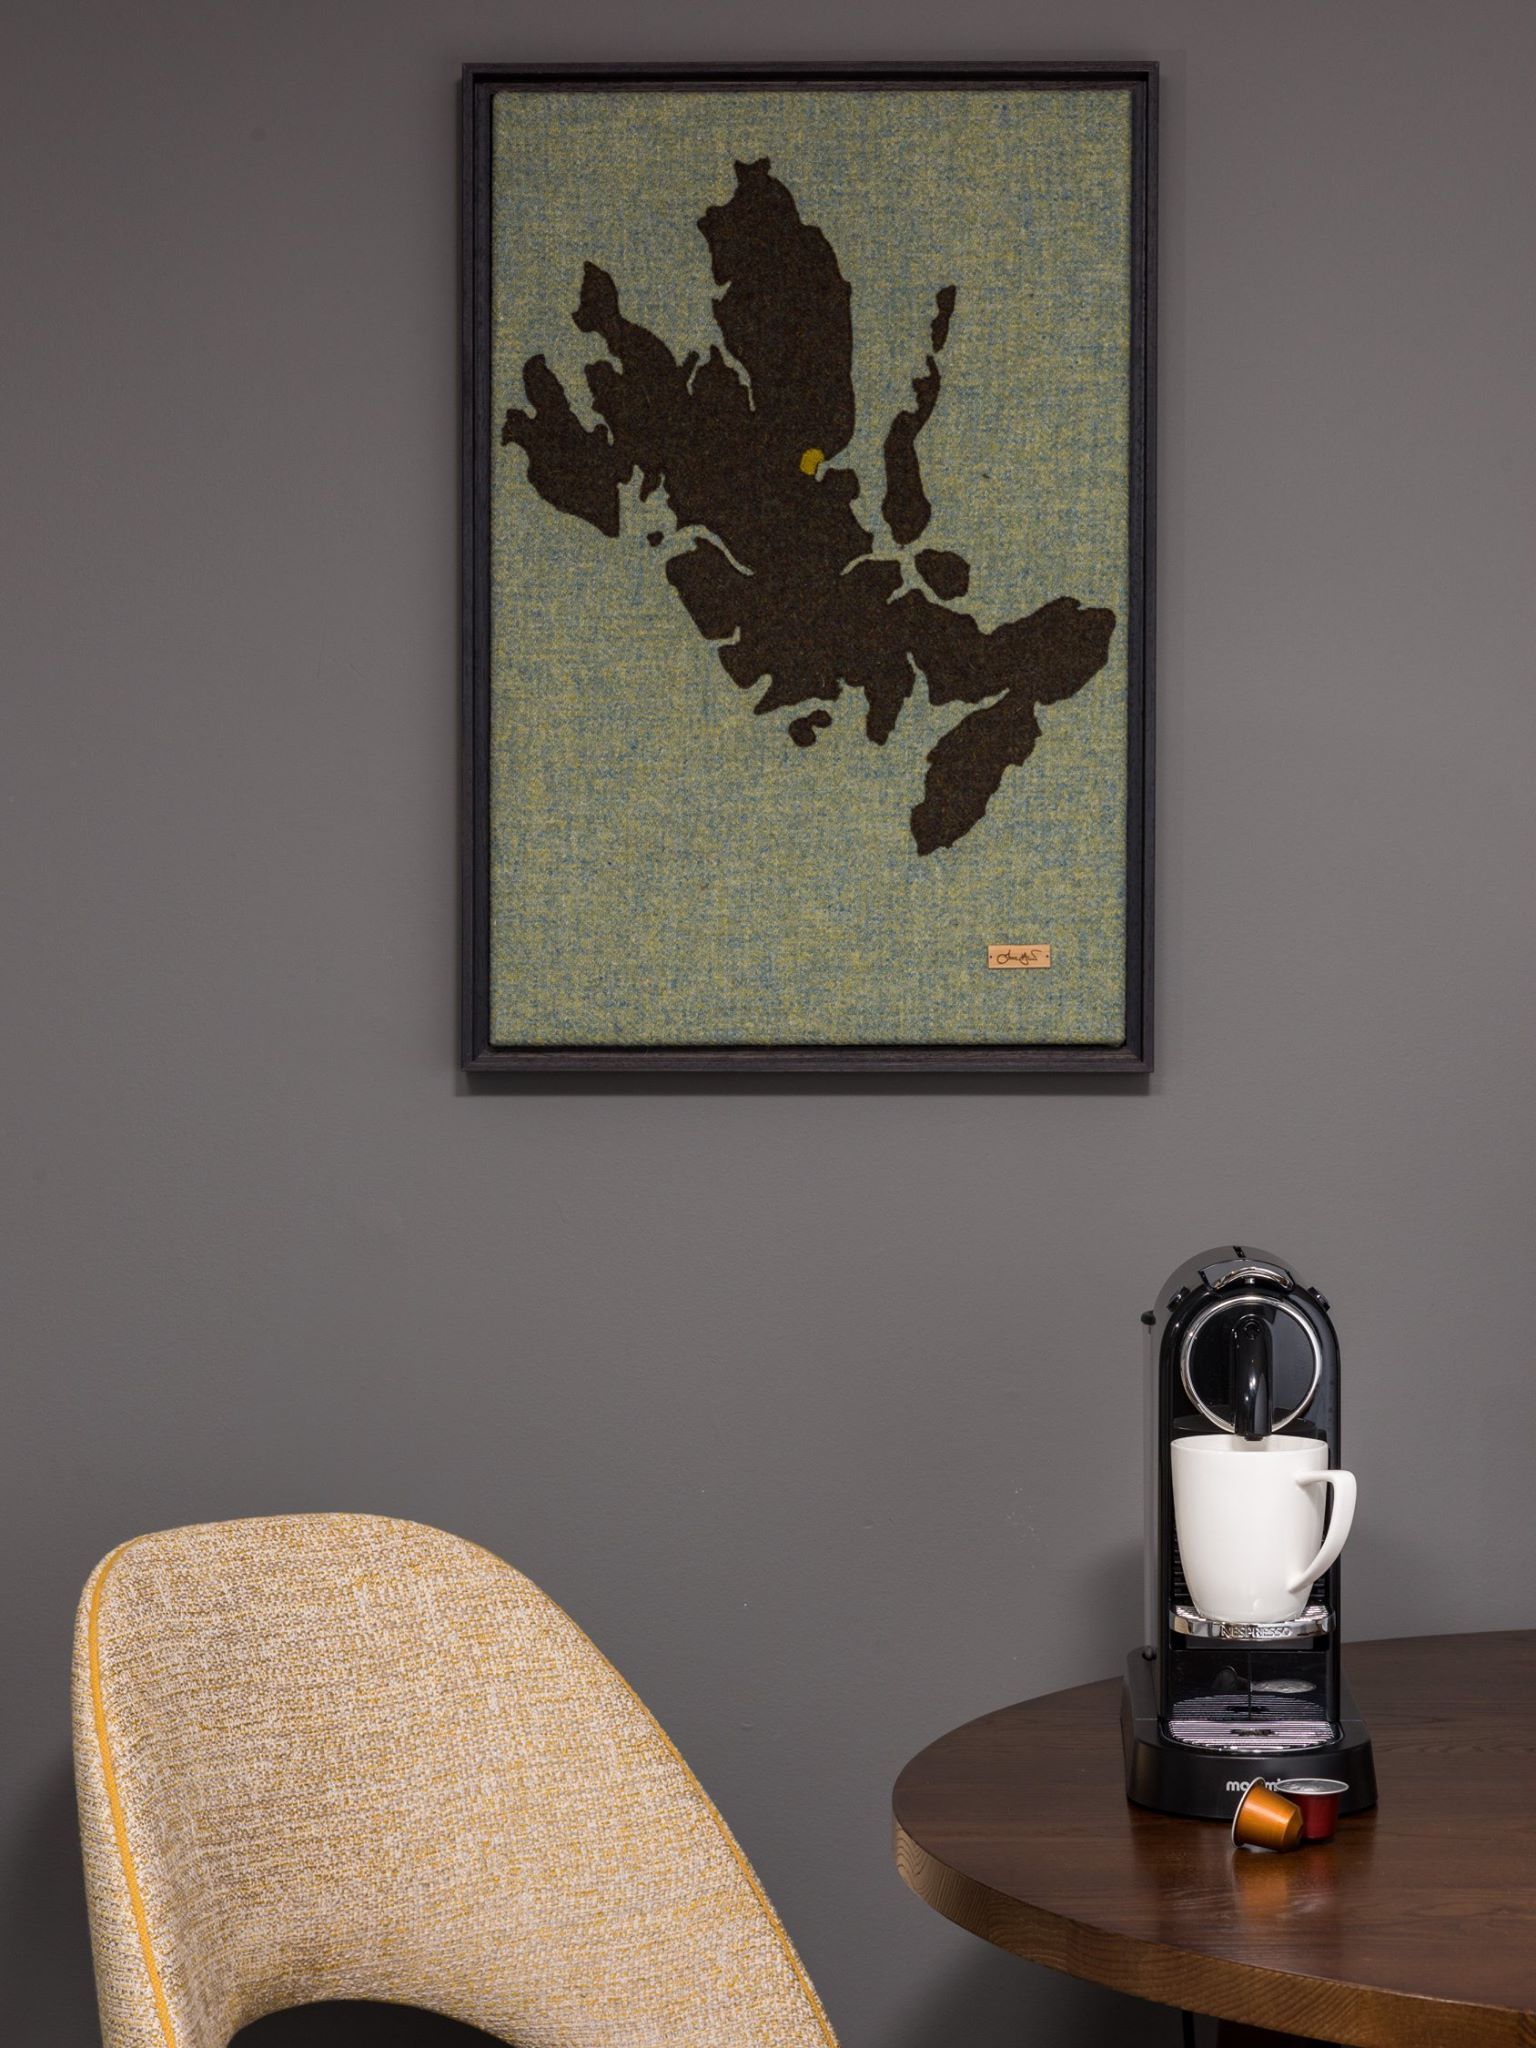 Marmalade-Skye-Map-Art-Jane-Hunter-BedRoom.jpg